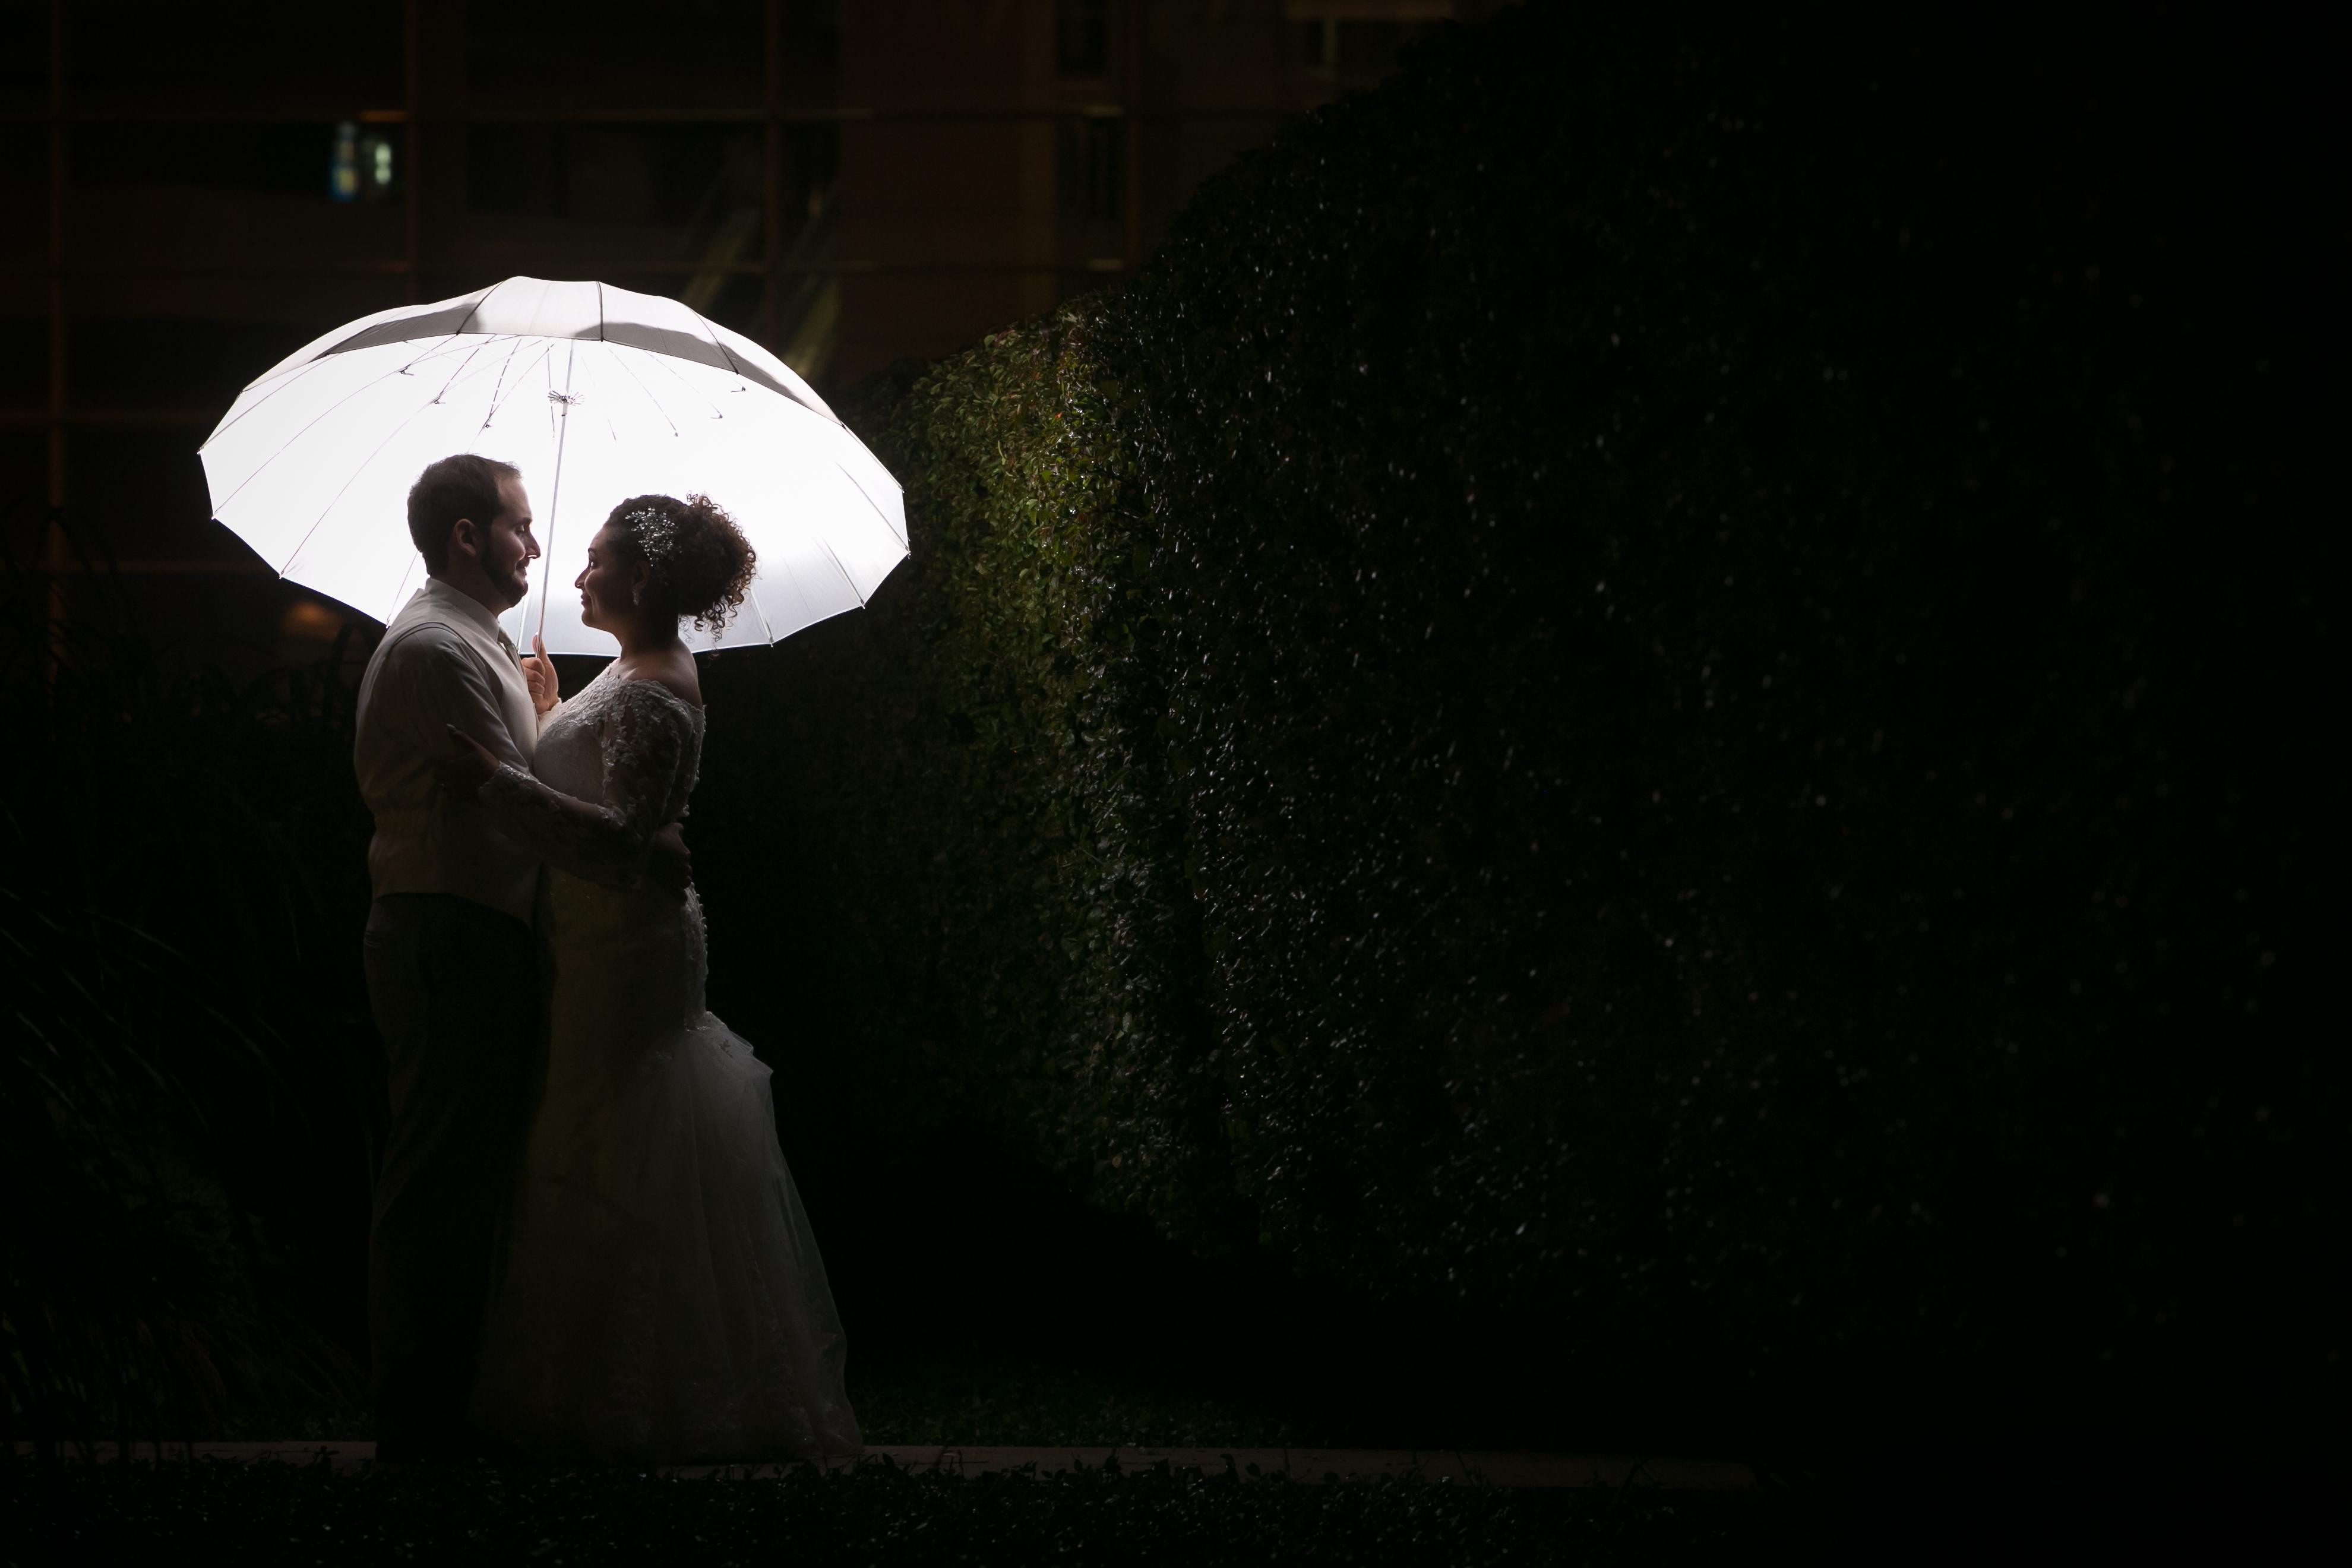 Bride and Groom Portrait: Holding White Umbrella